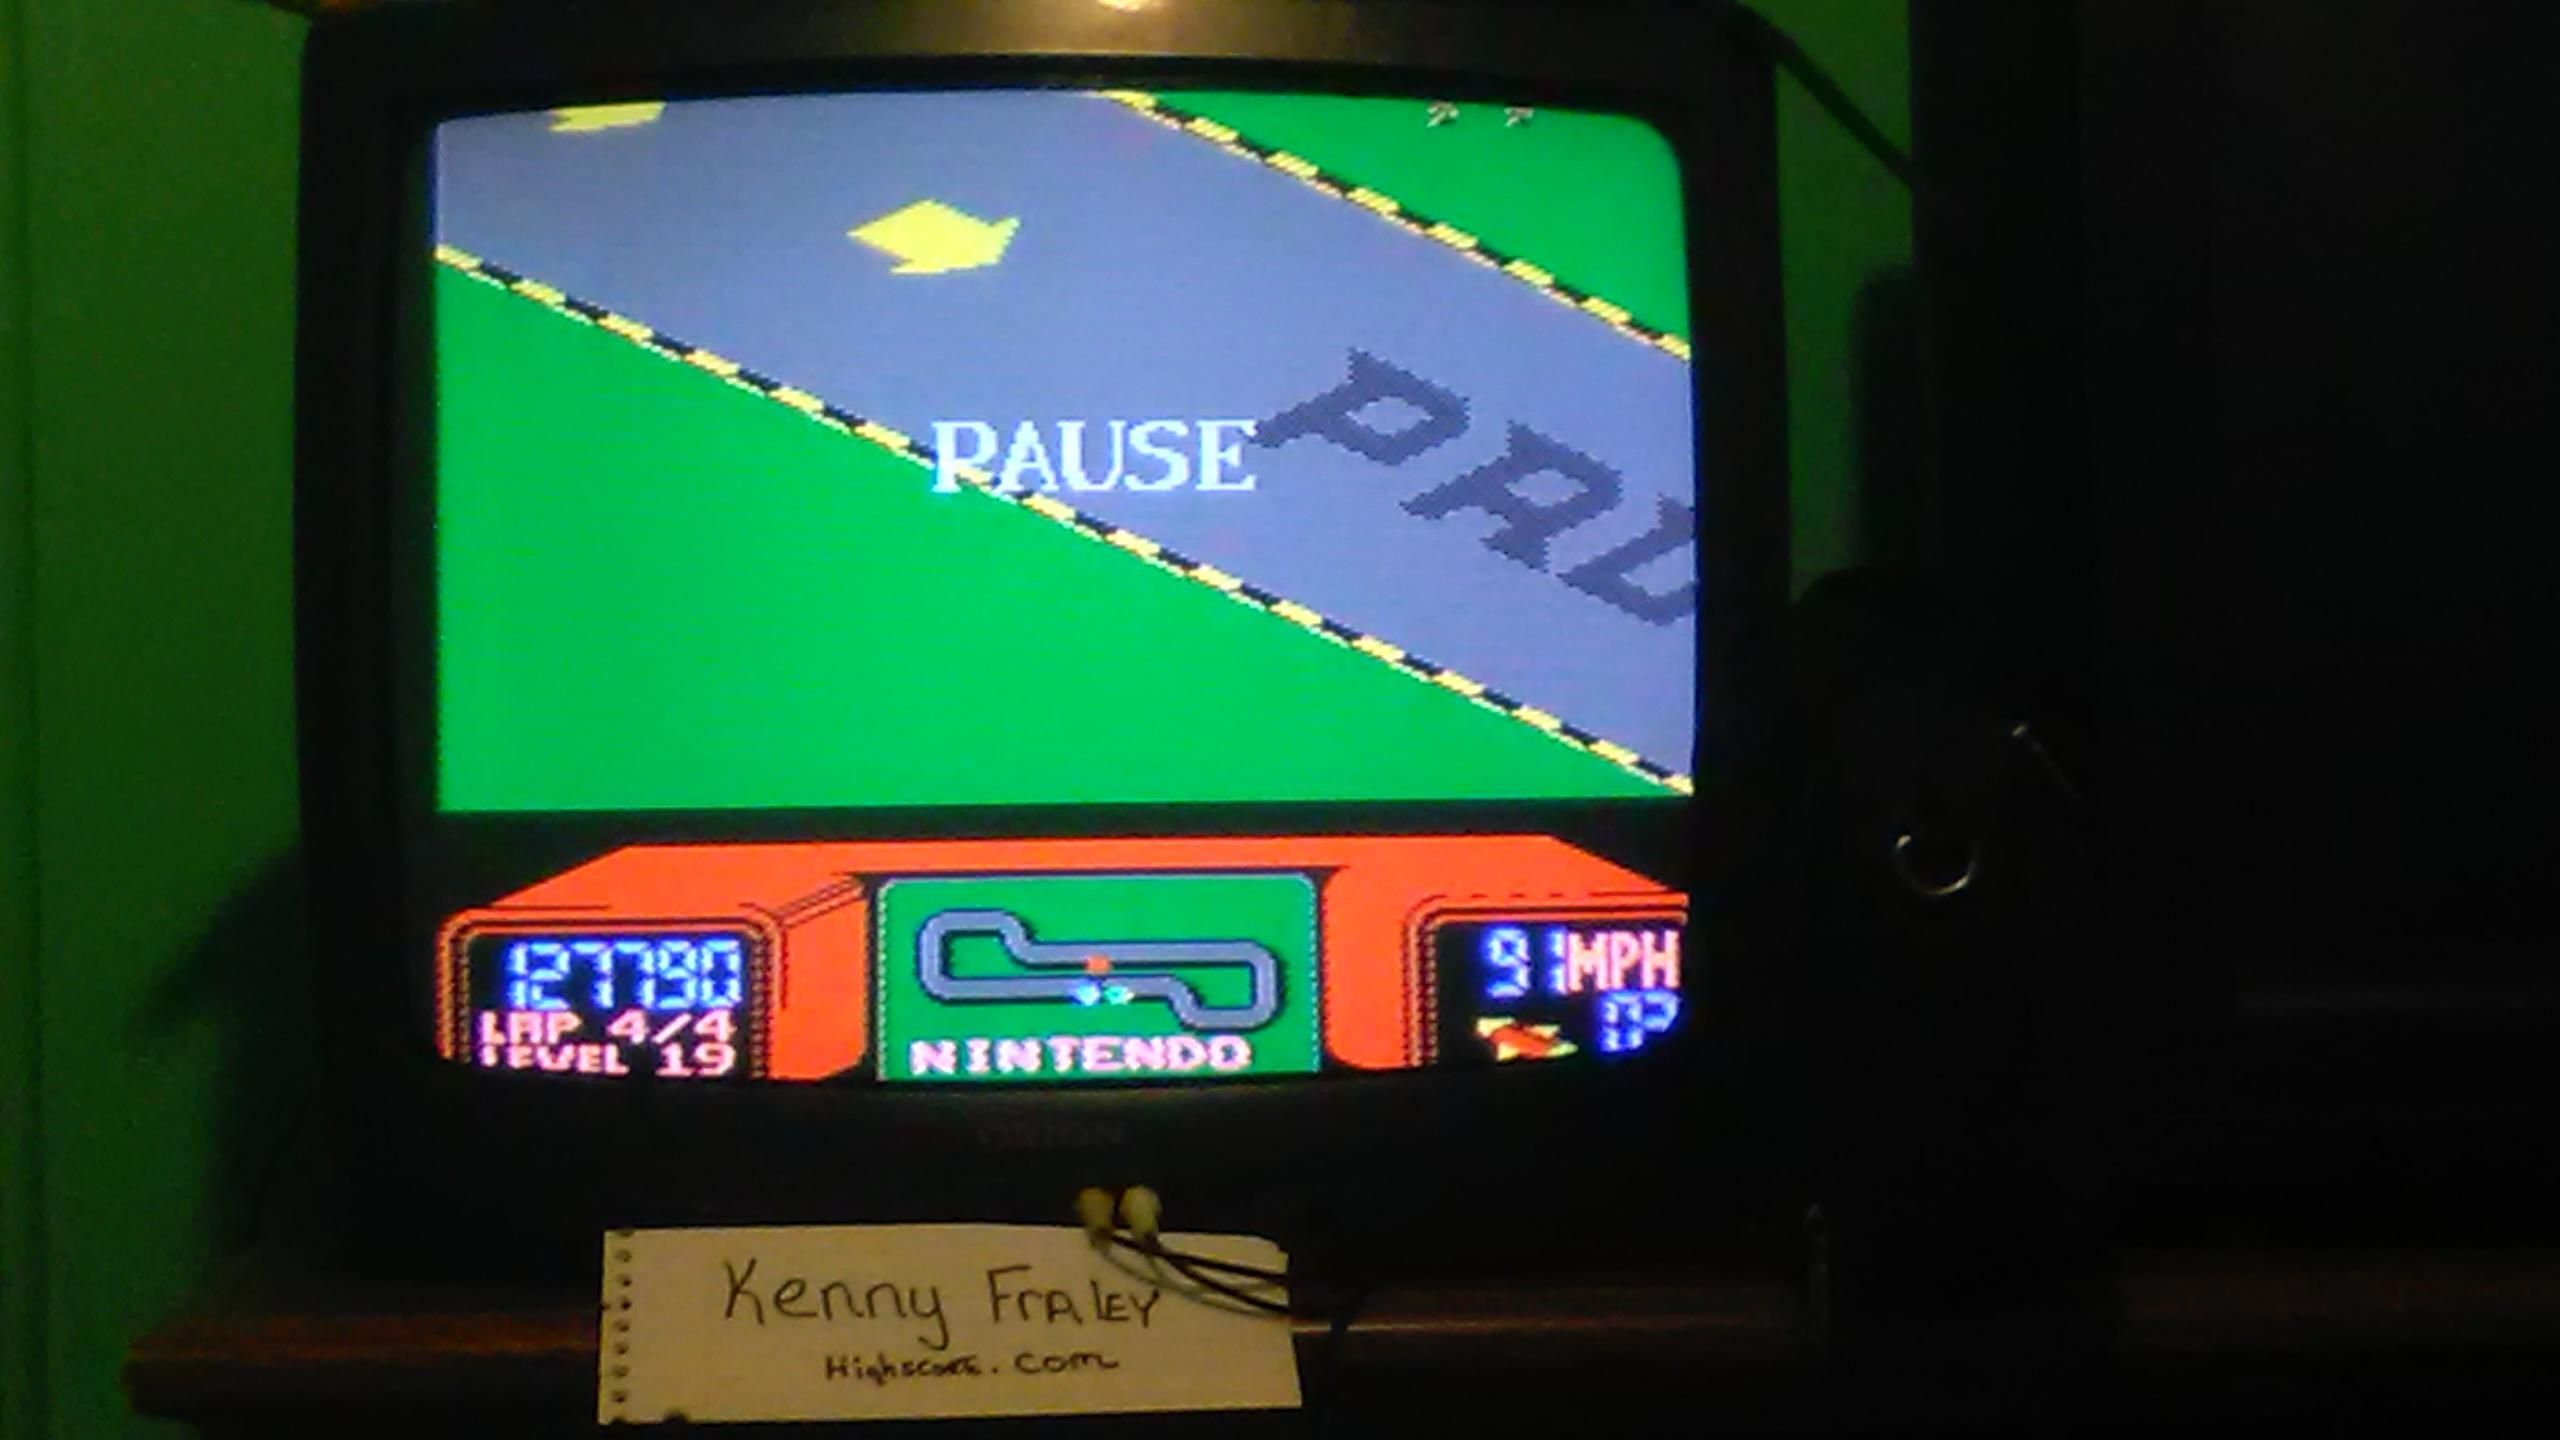 kennyfraley: R.C. Pro-Am (NES/Famicom) 127,790 points on 2017-05-04 23:32:46